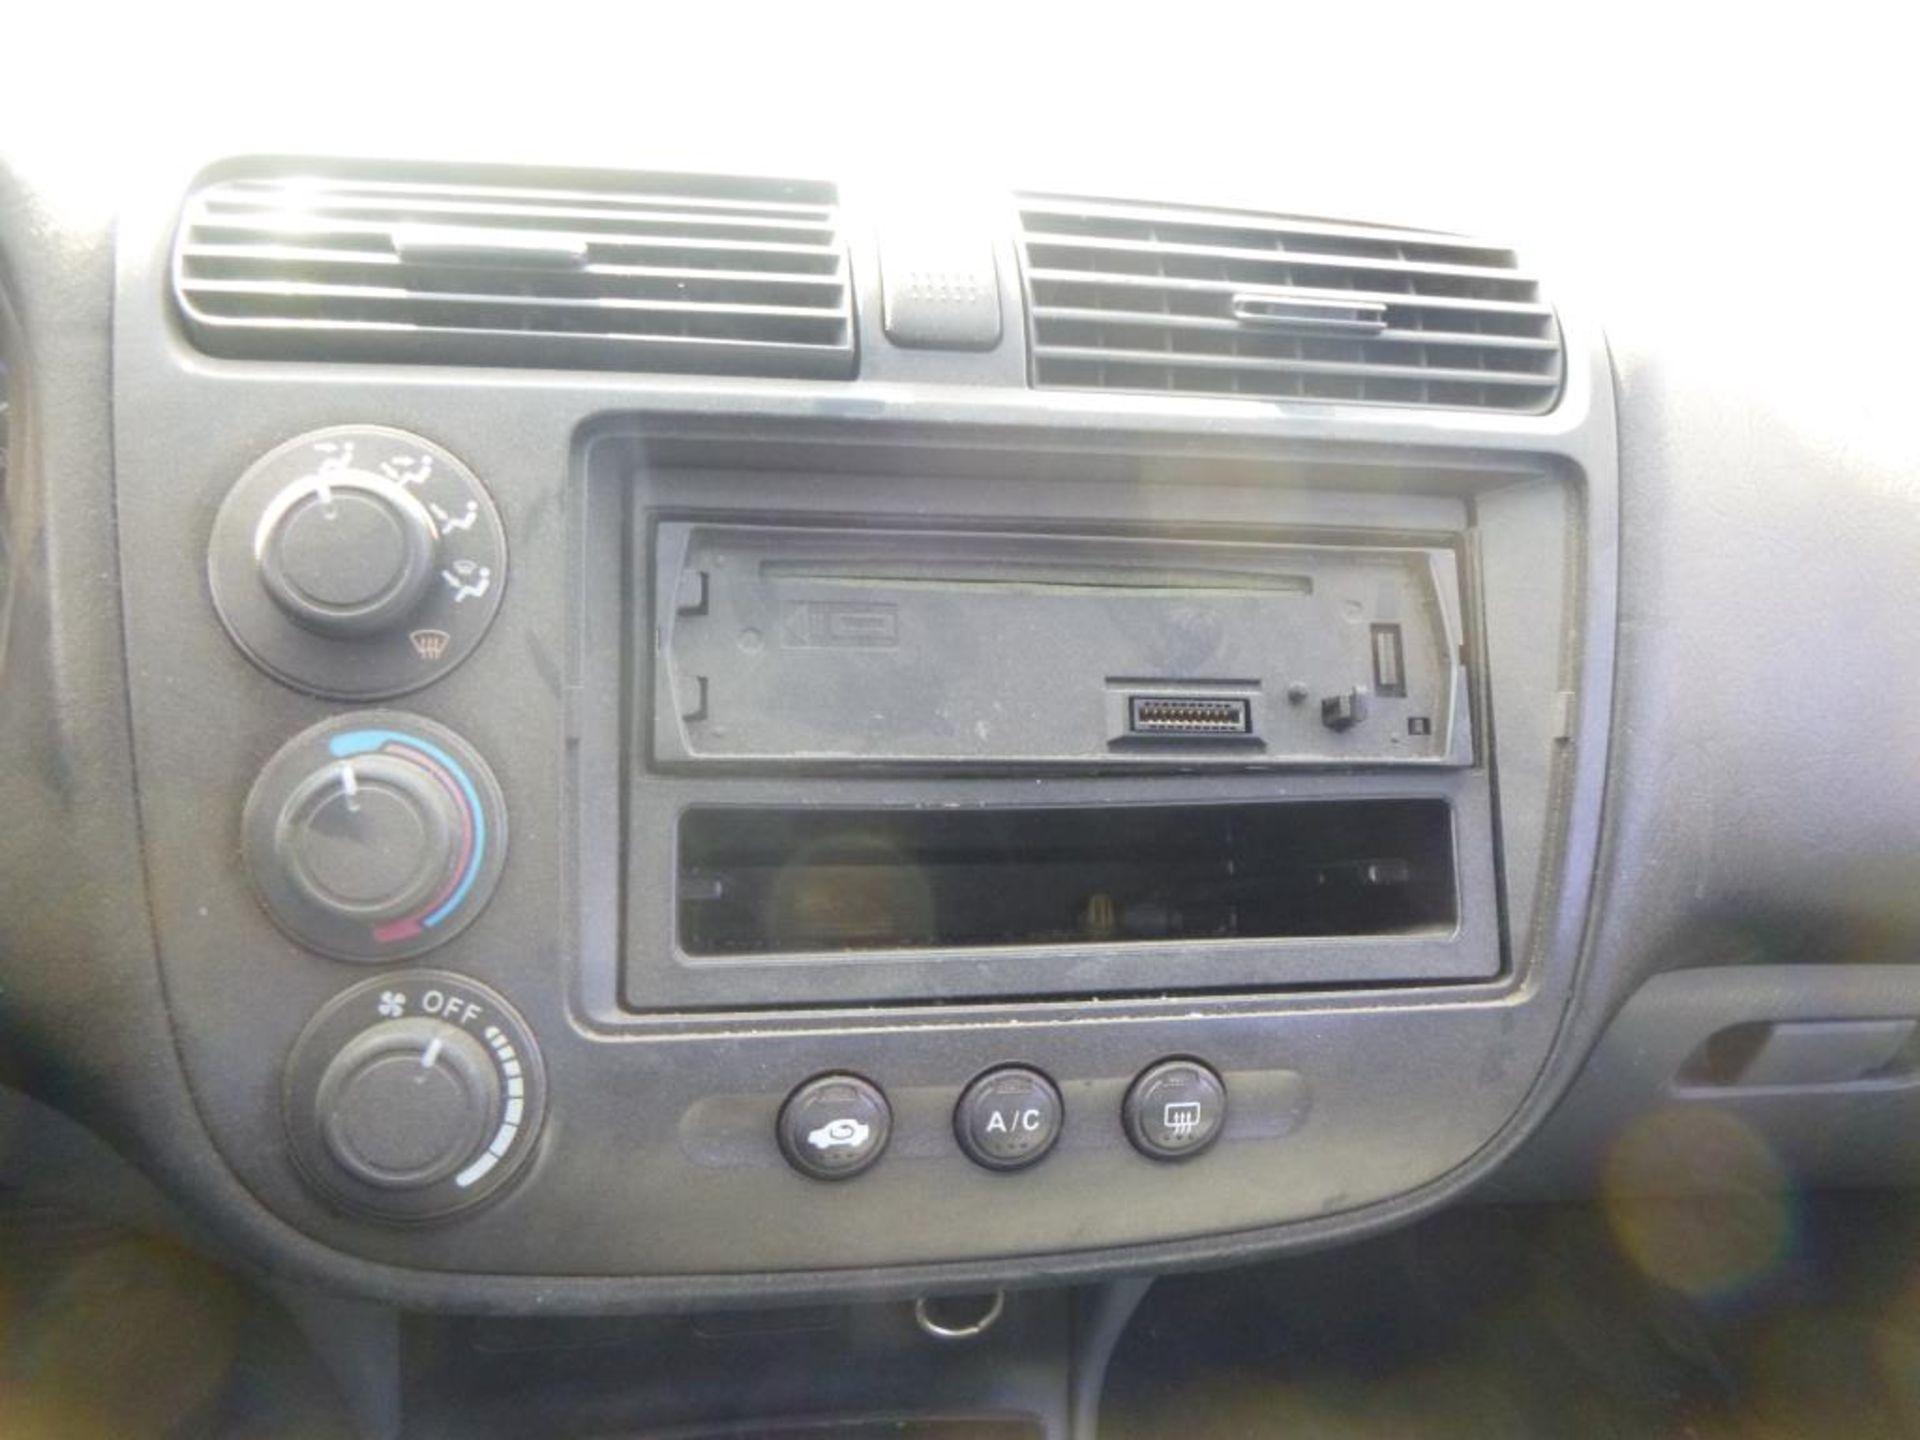 2004 Honda Civic - Image 13 of 14